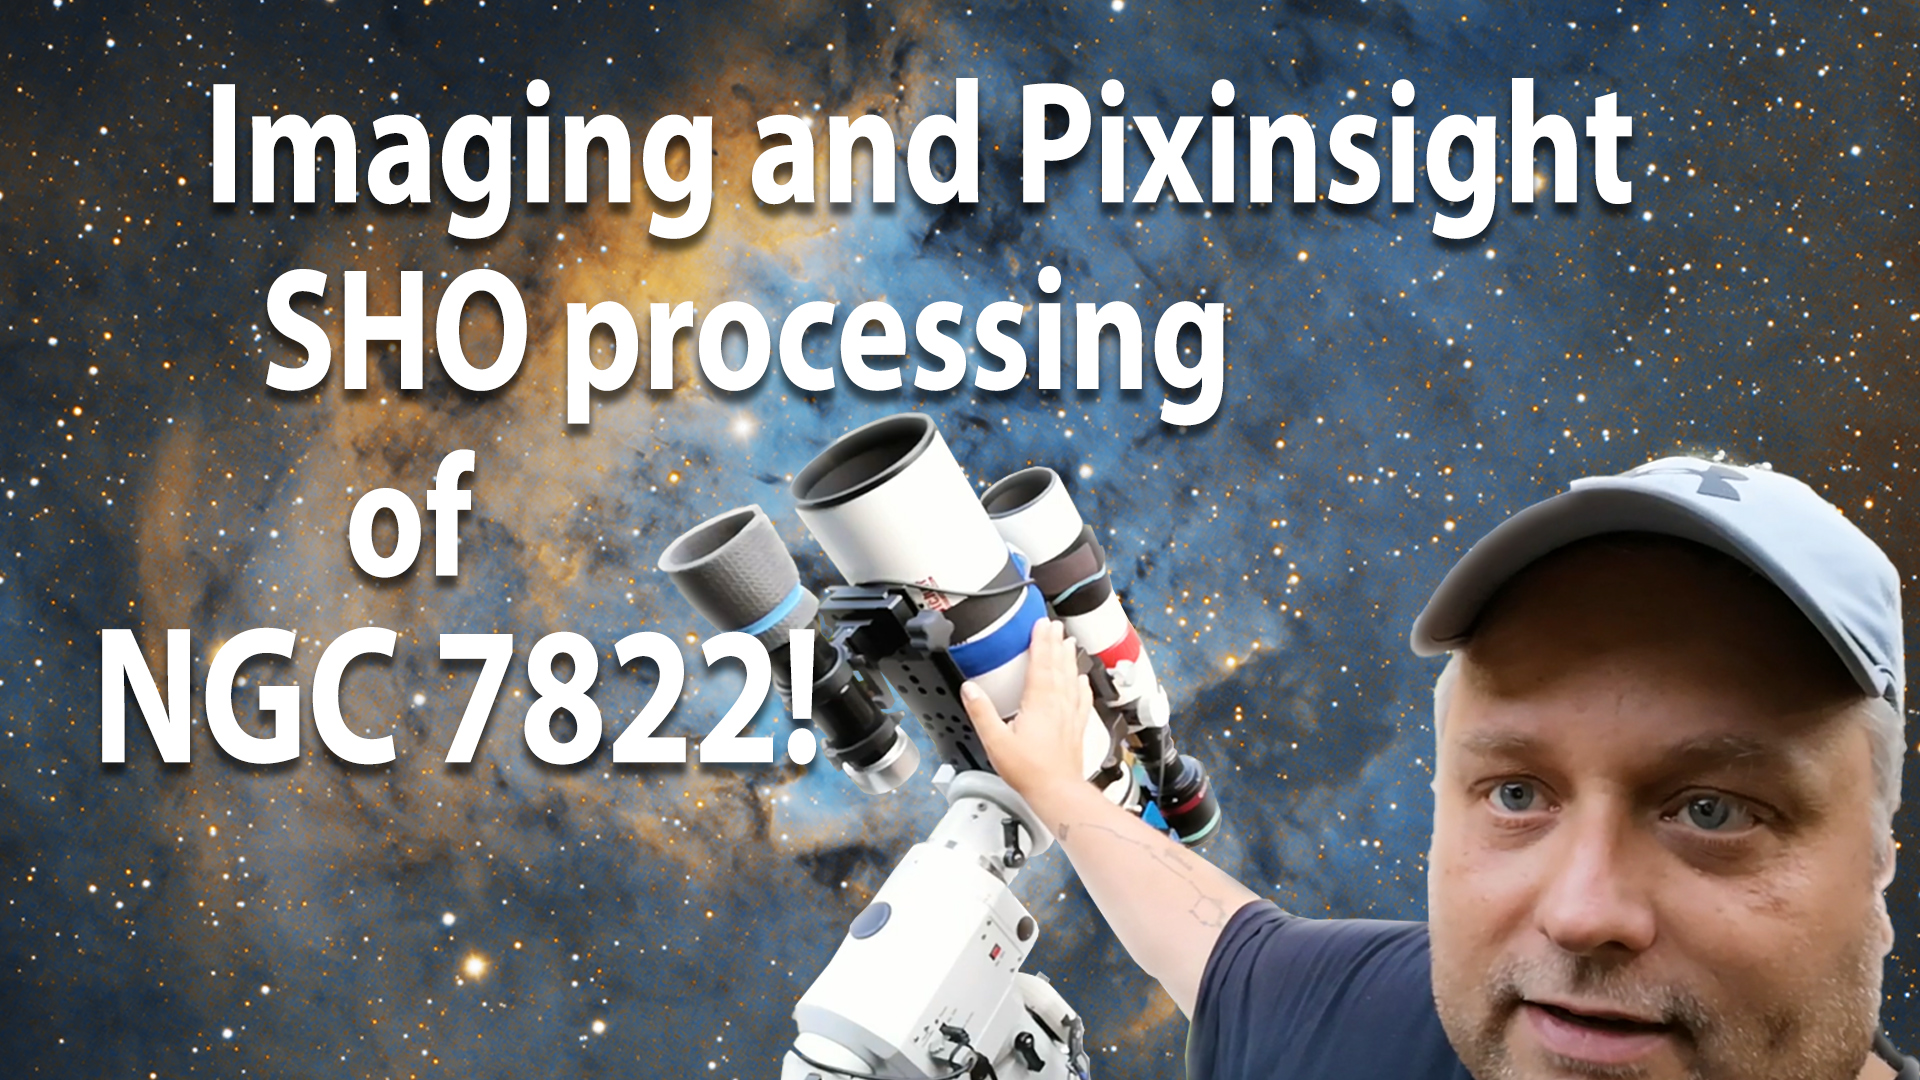 Pixinsight SHO processing